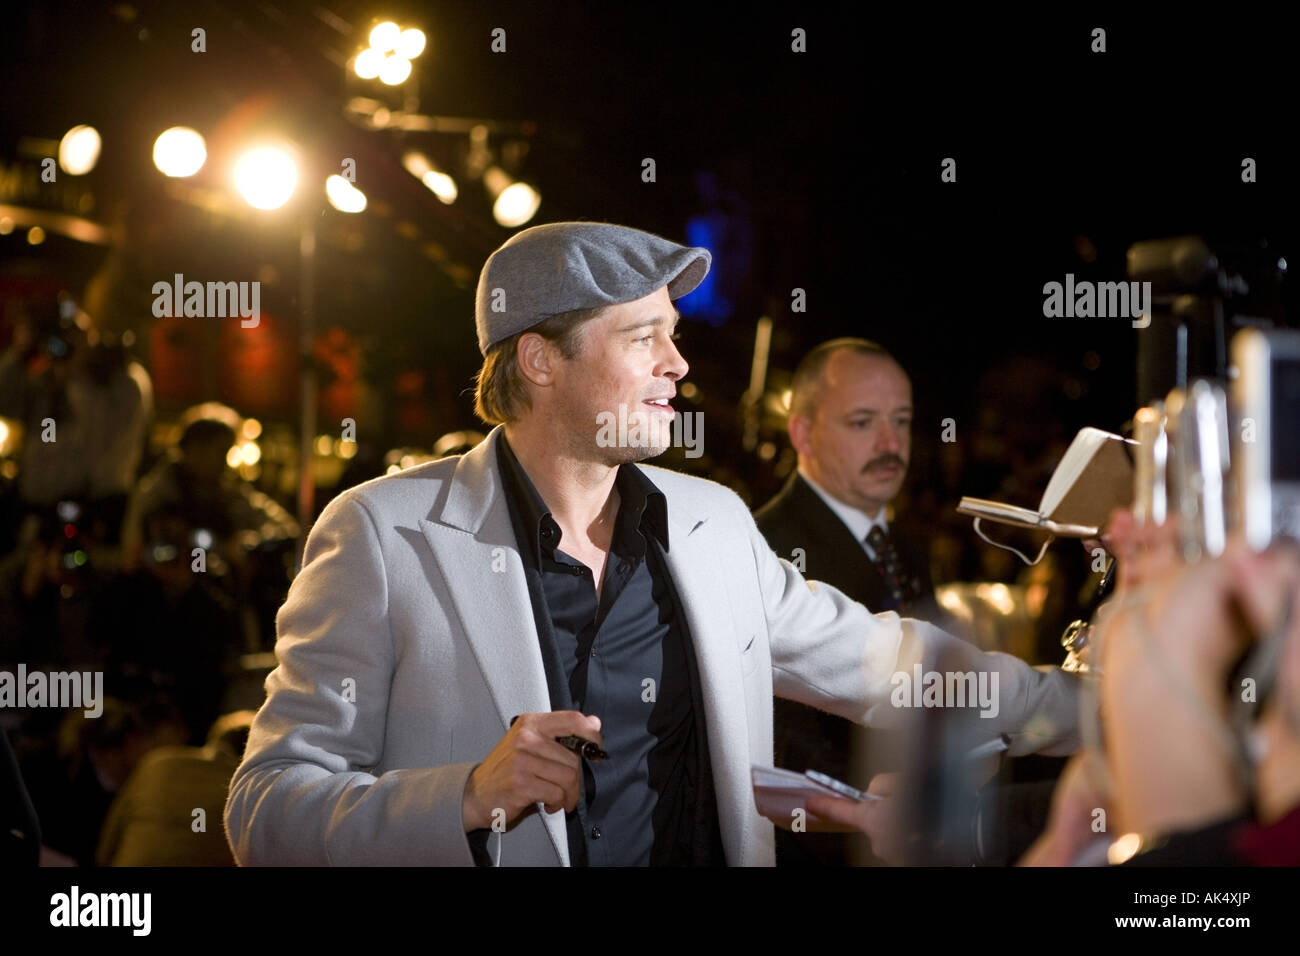 Beo Wulf - European Film premiere Londres Leicester Square, Brad Pitt con Angelina Jolie. Imagen De Stock